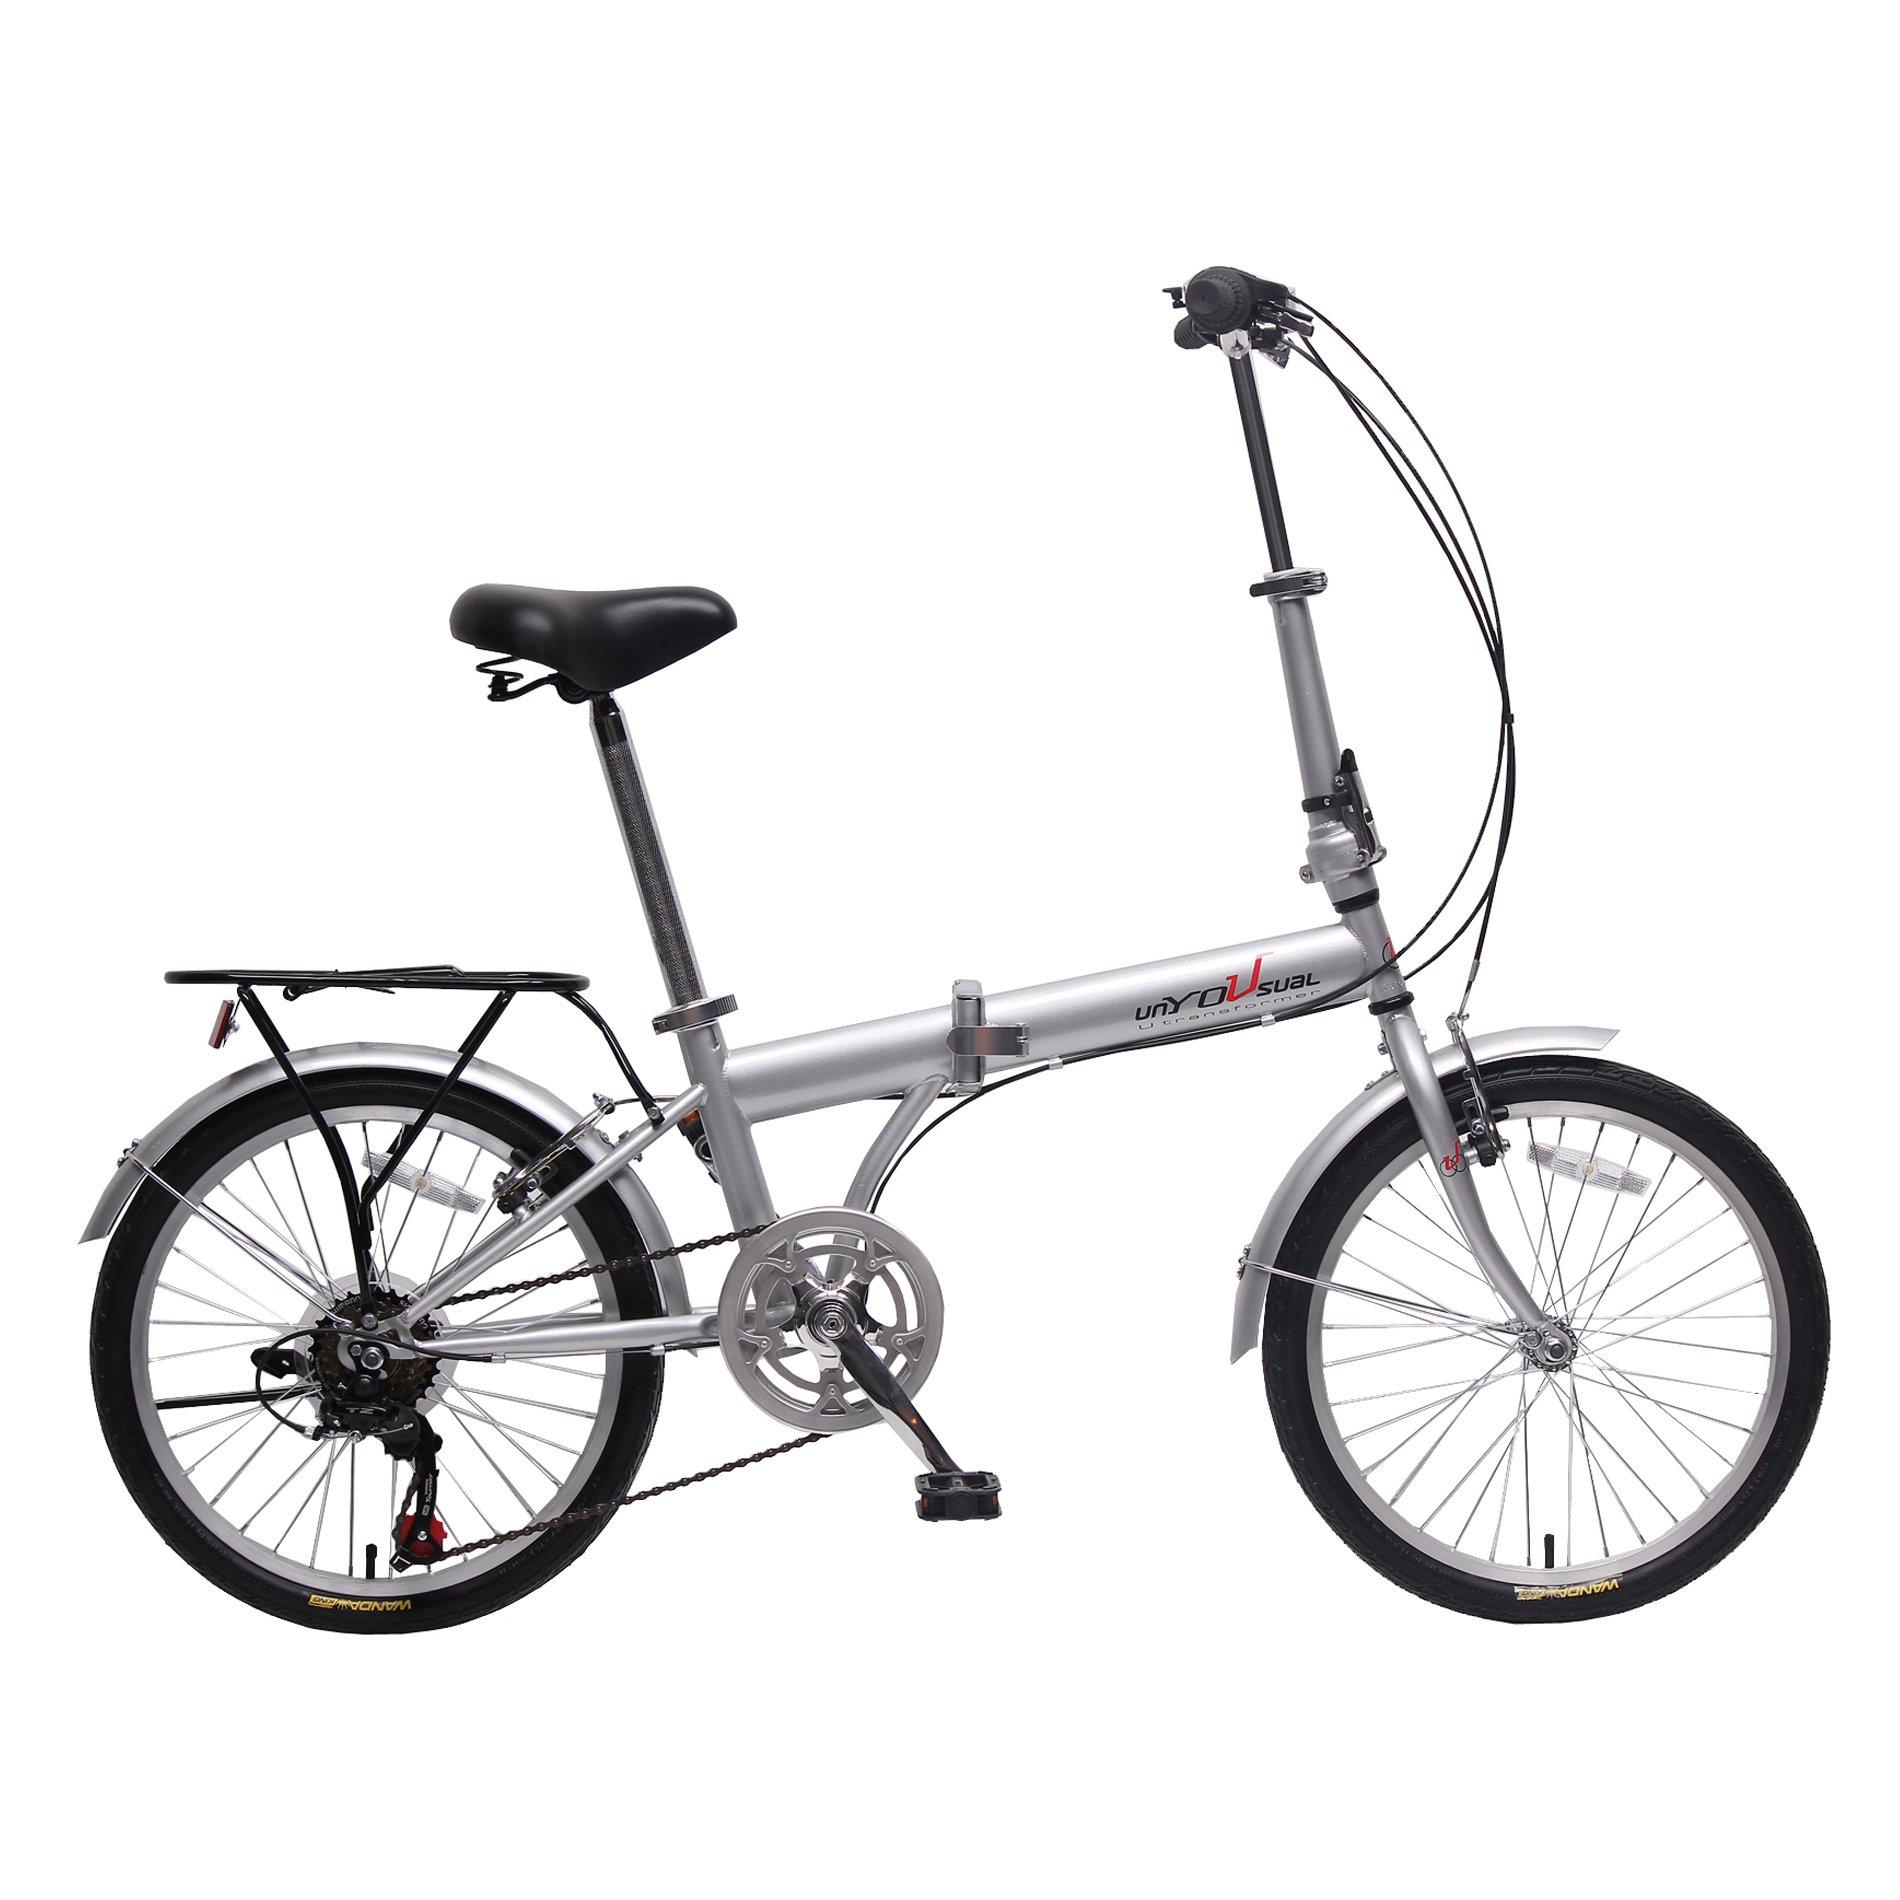 unYOUsual U transformer 20'' Folding City Bike Bicycle 6 Speed Shimano Gear Steel Frame Mudguard Rear Carrier Silver